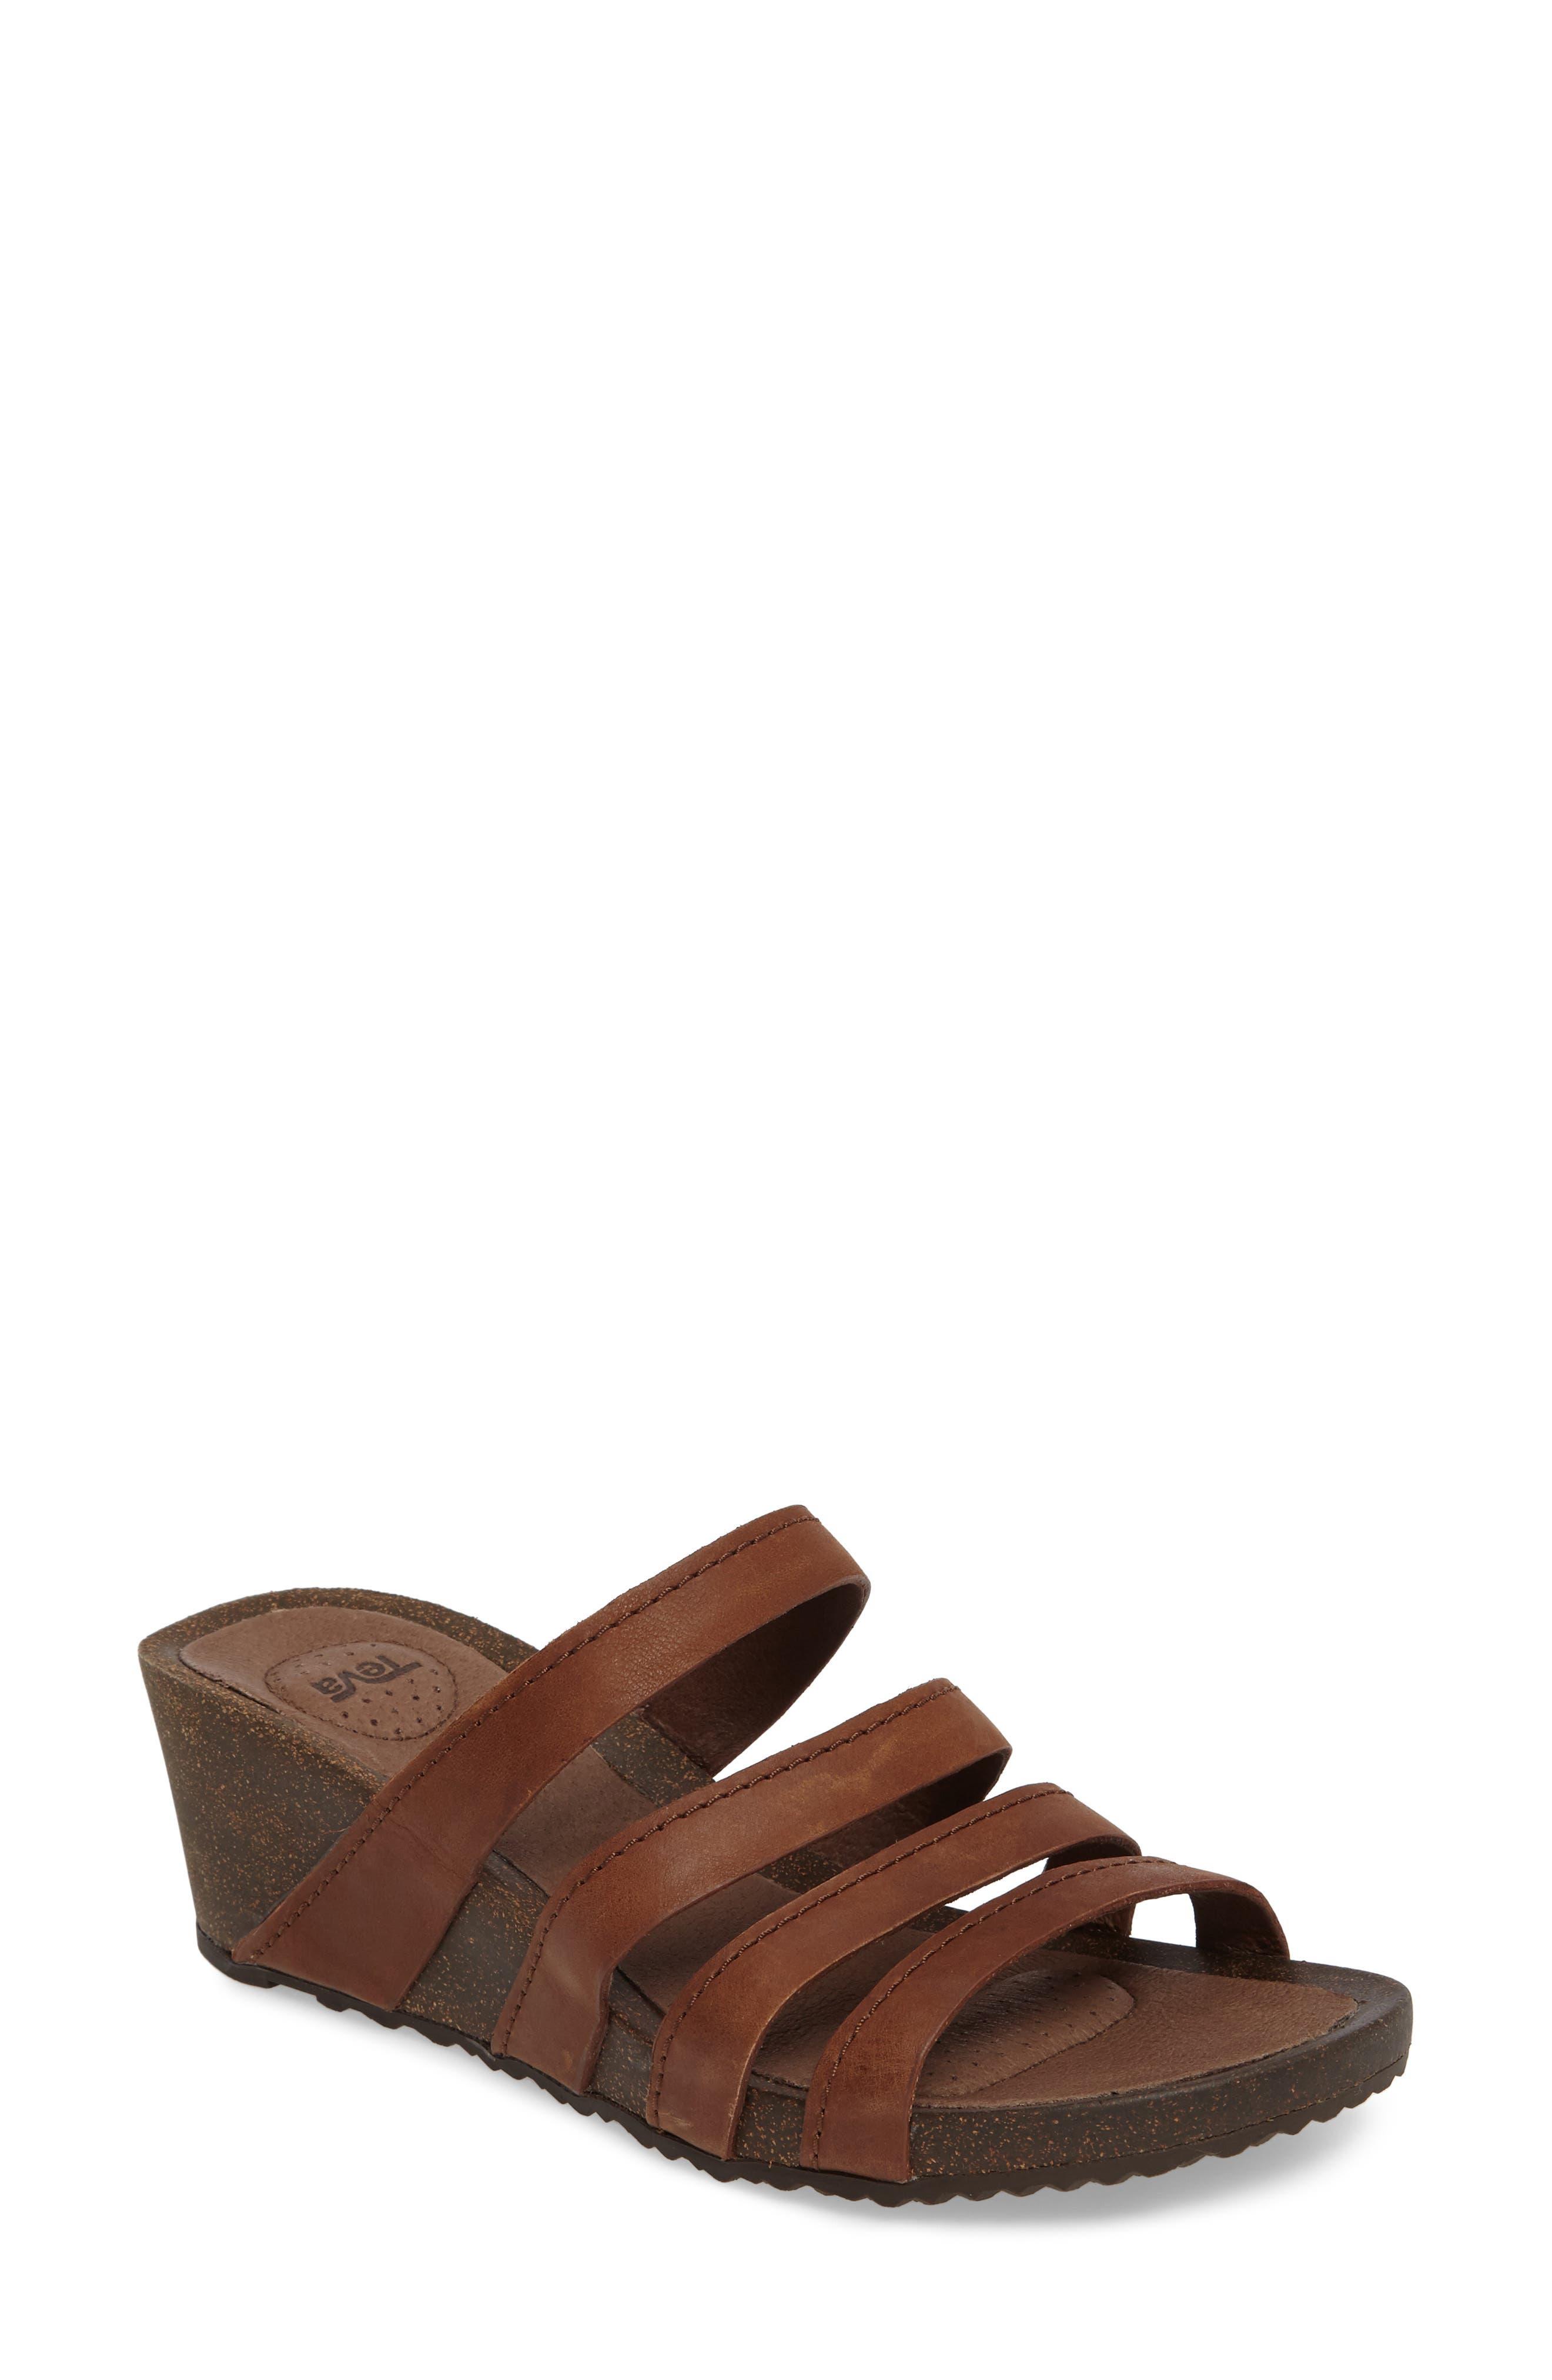 TEVA Ysidro Wedge Slide Sandal